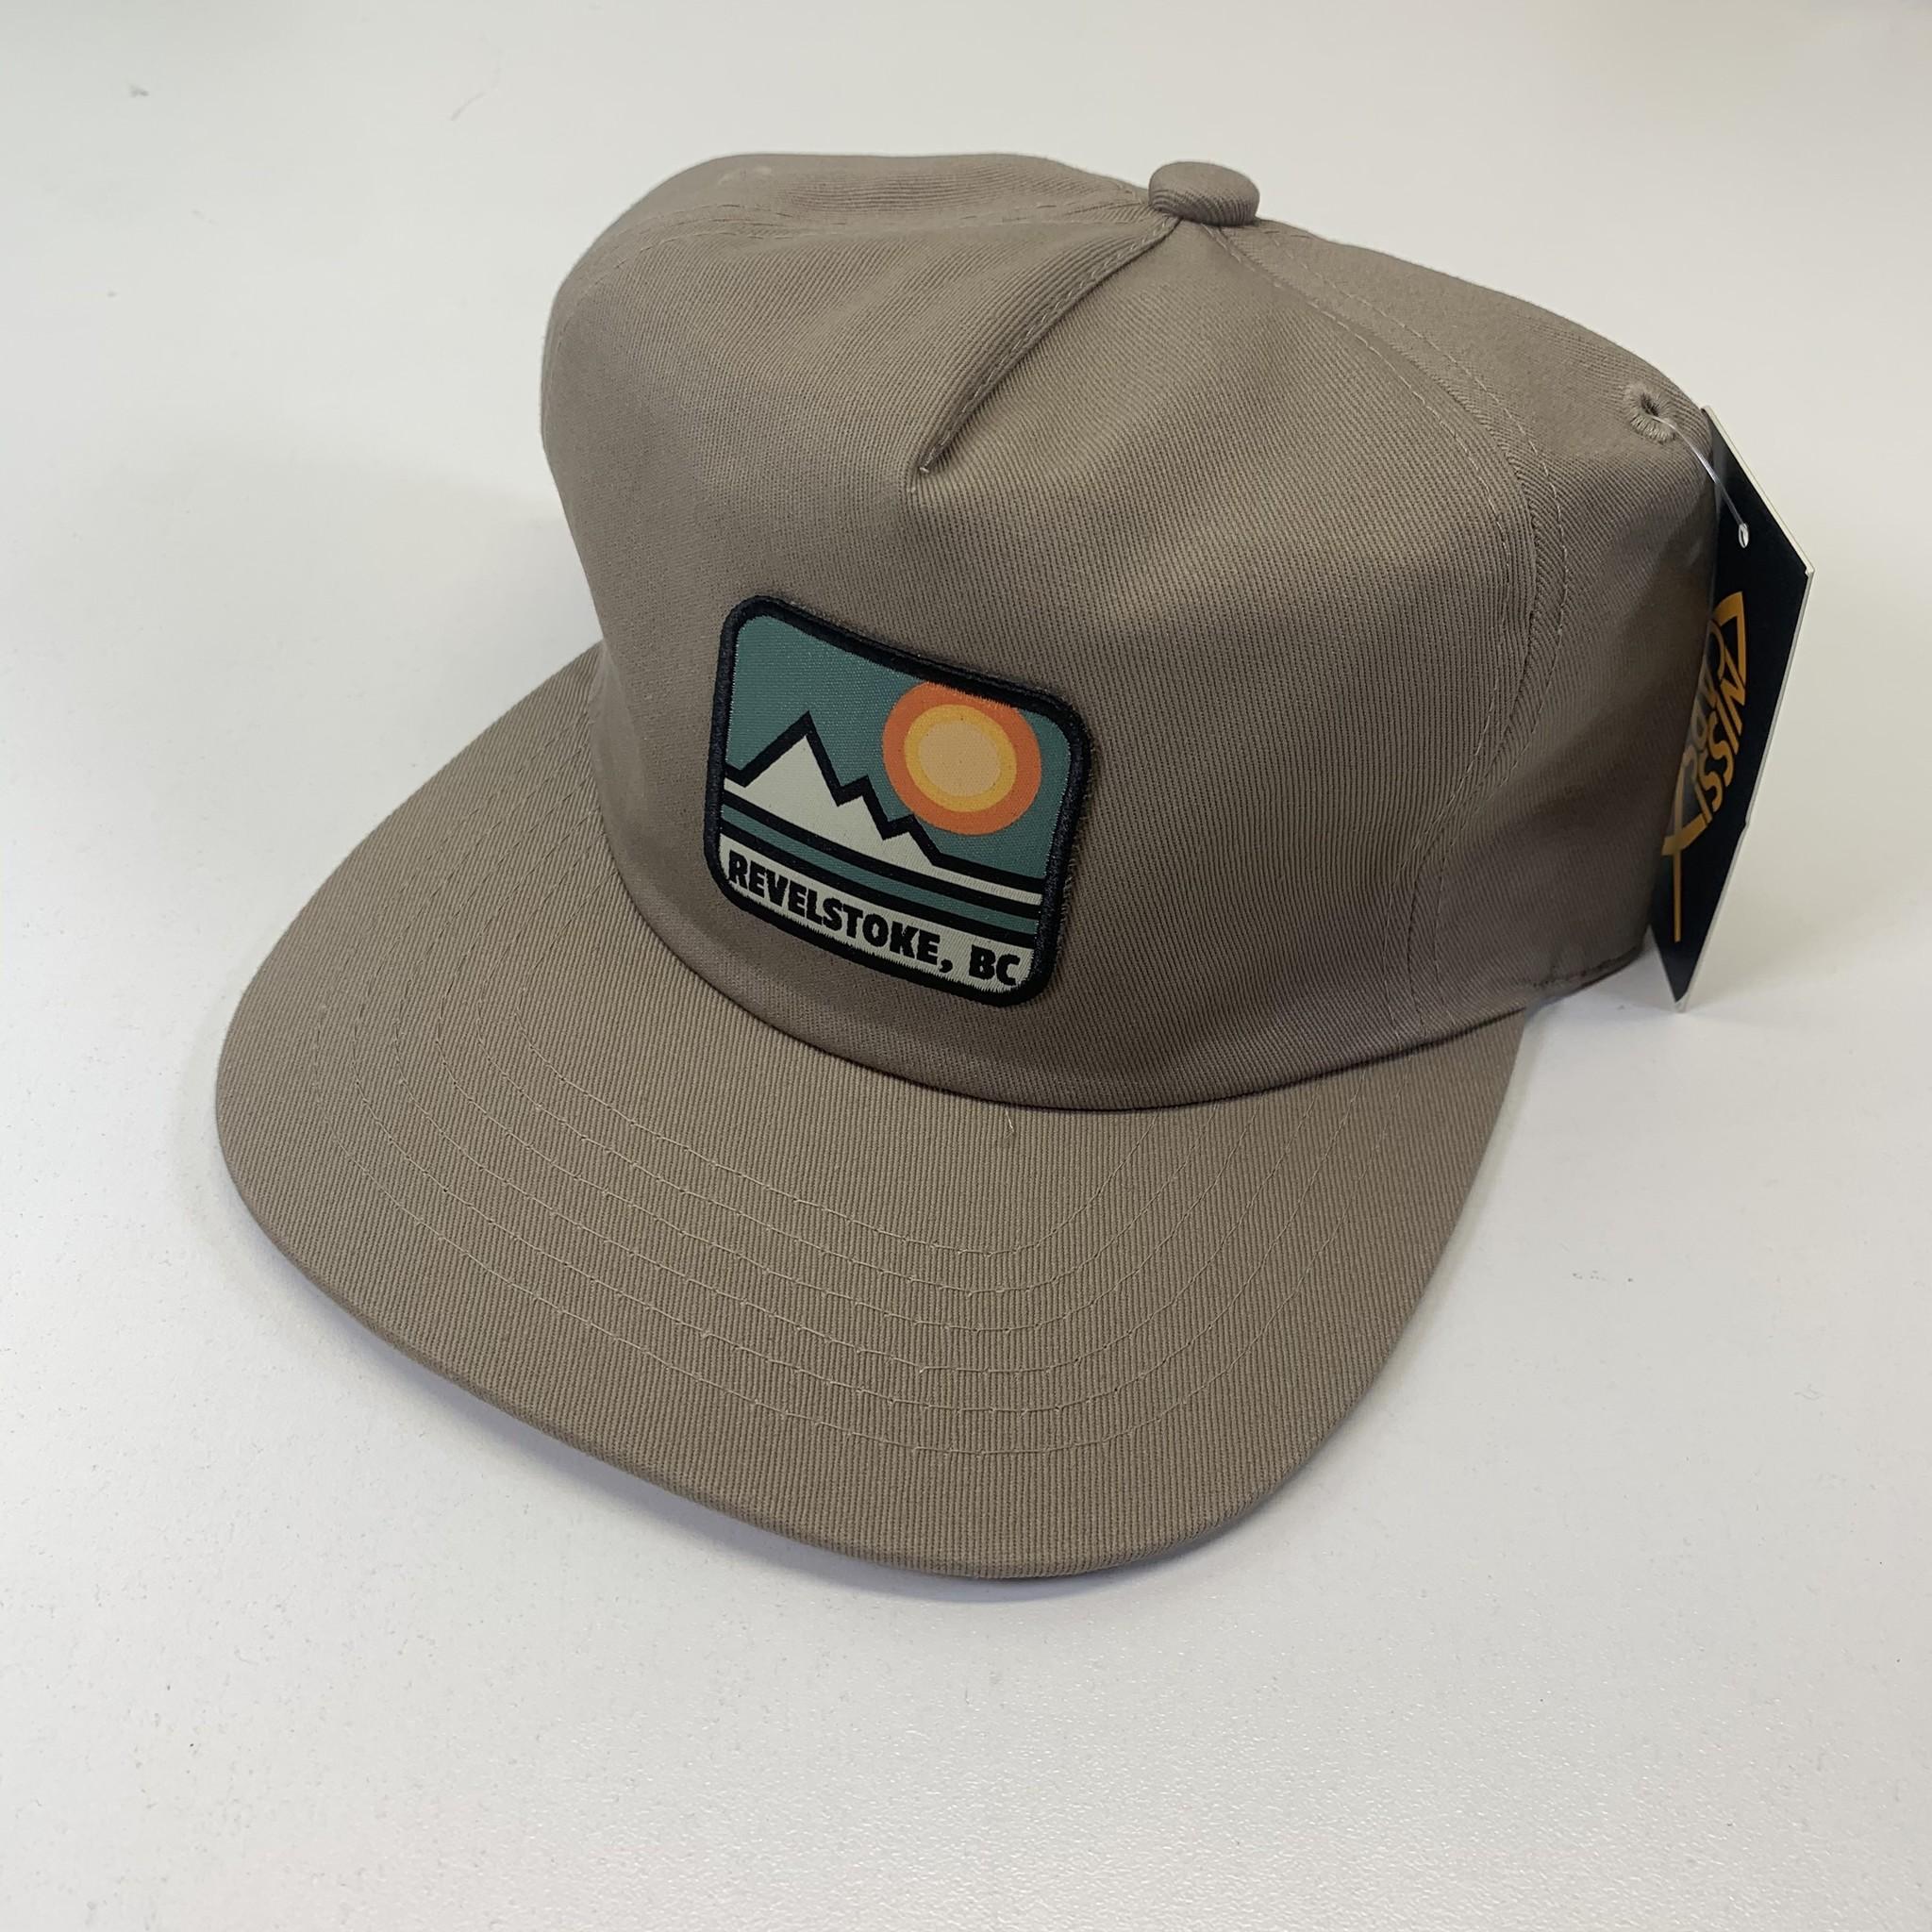 Revelstoke Trading Post Revelstoke - Retro Patch Cap (Khaki)